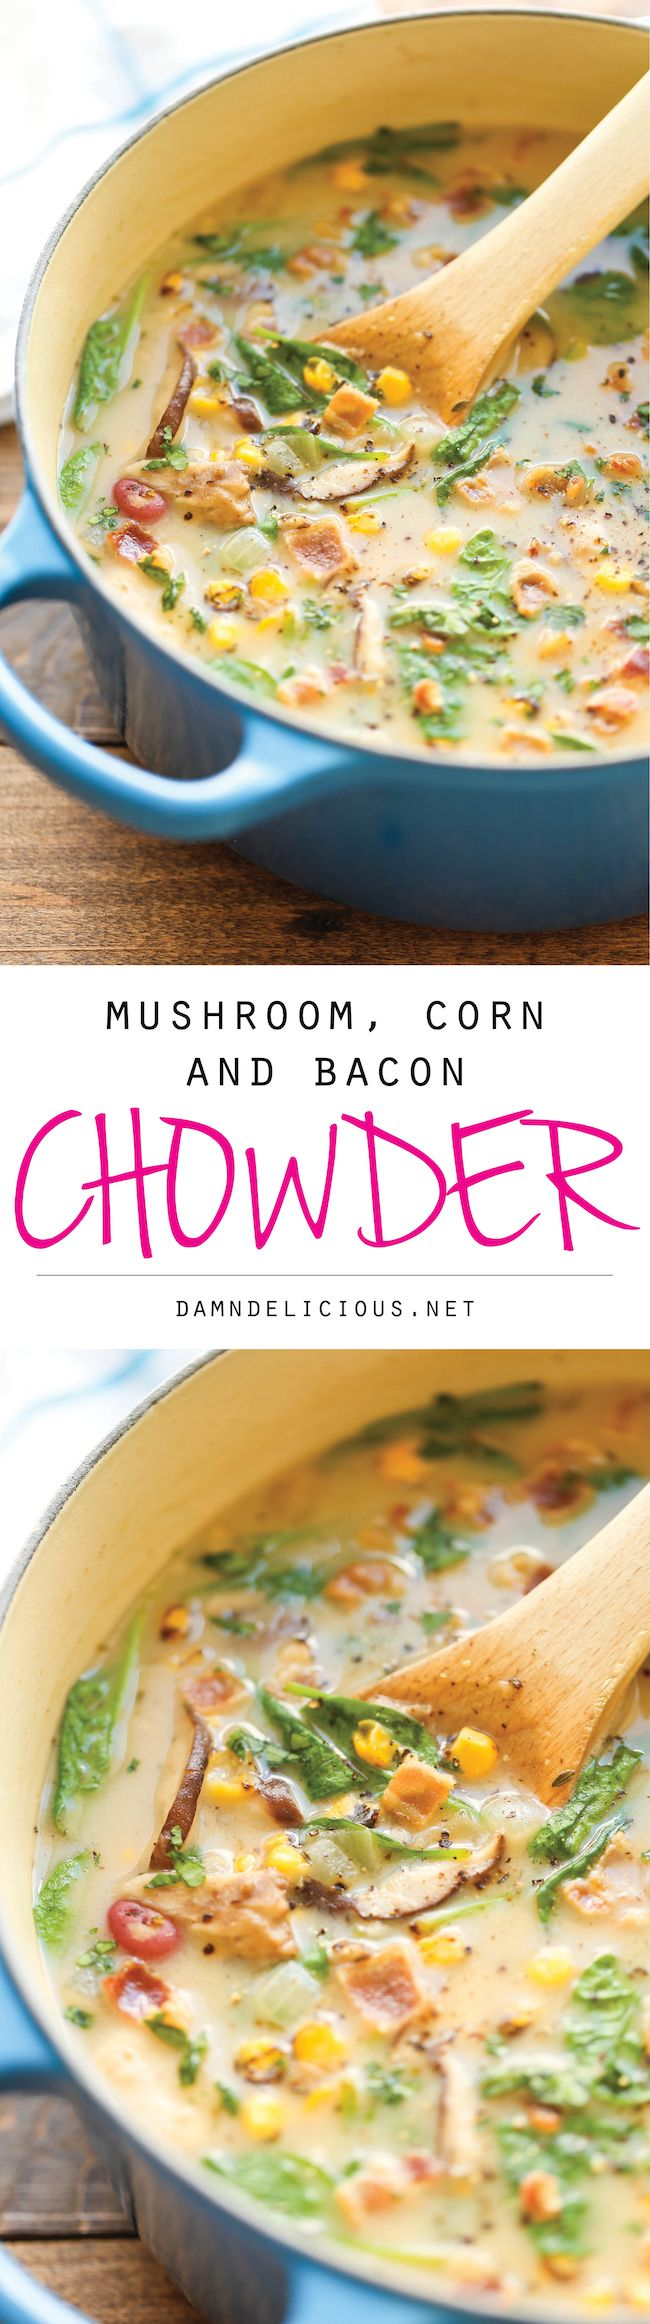 Mushroom, Corn and Bacon Chowder   damndelicious.com